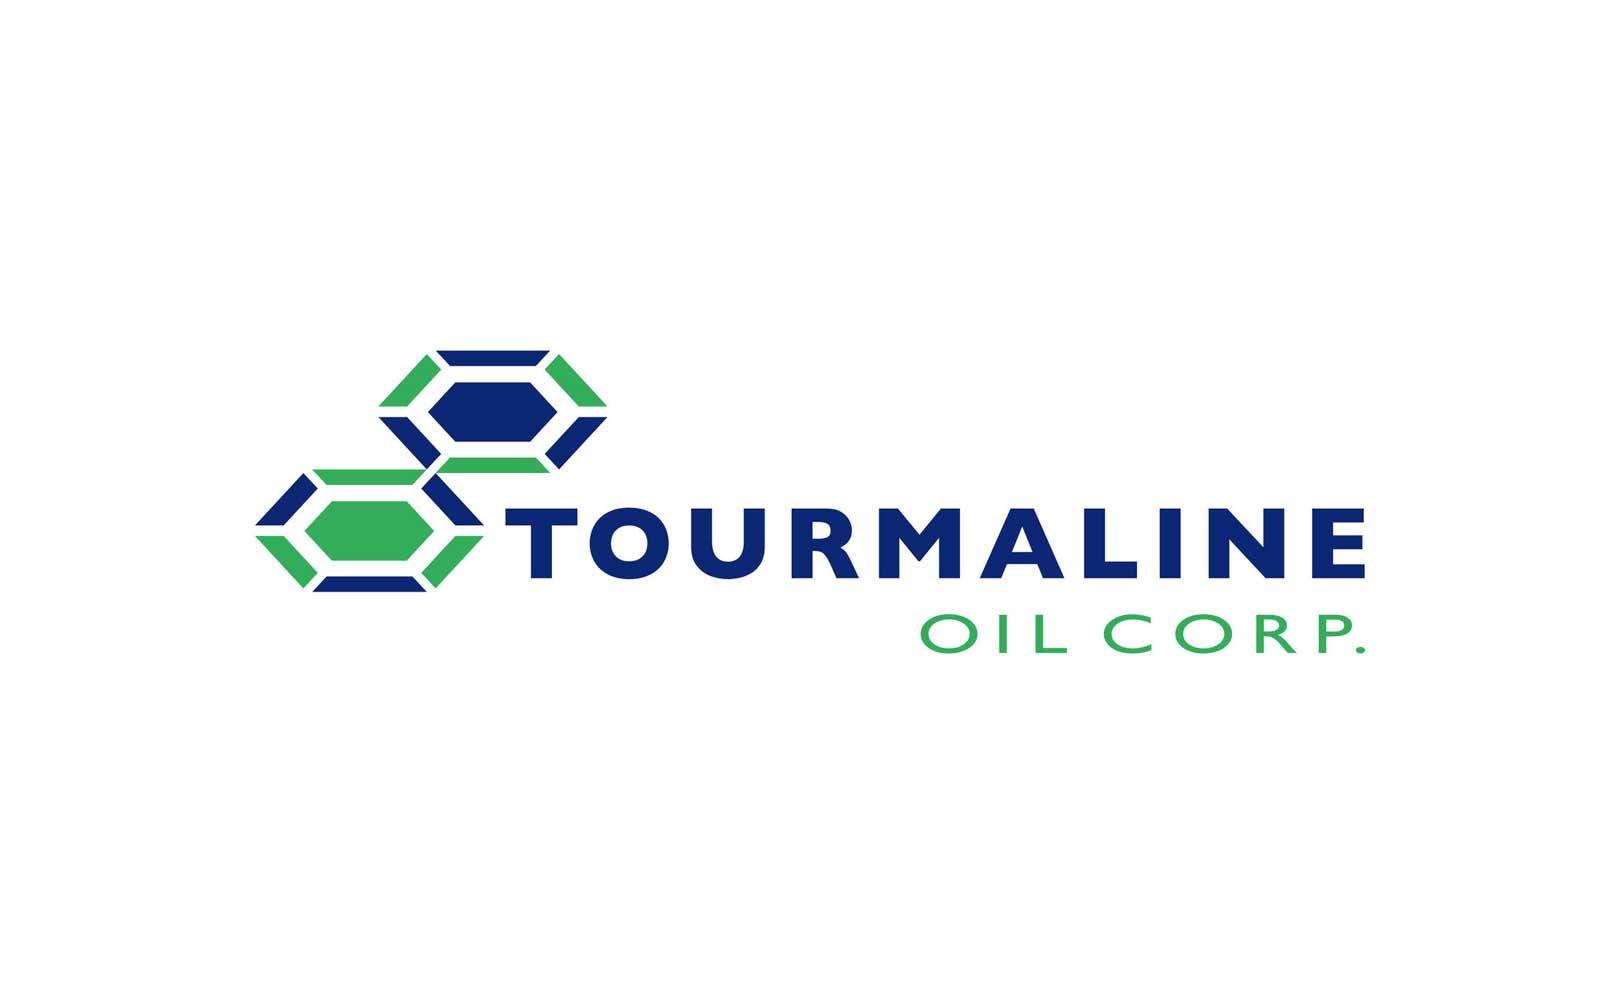 Tourmaline Oil Corp